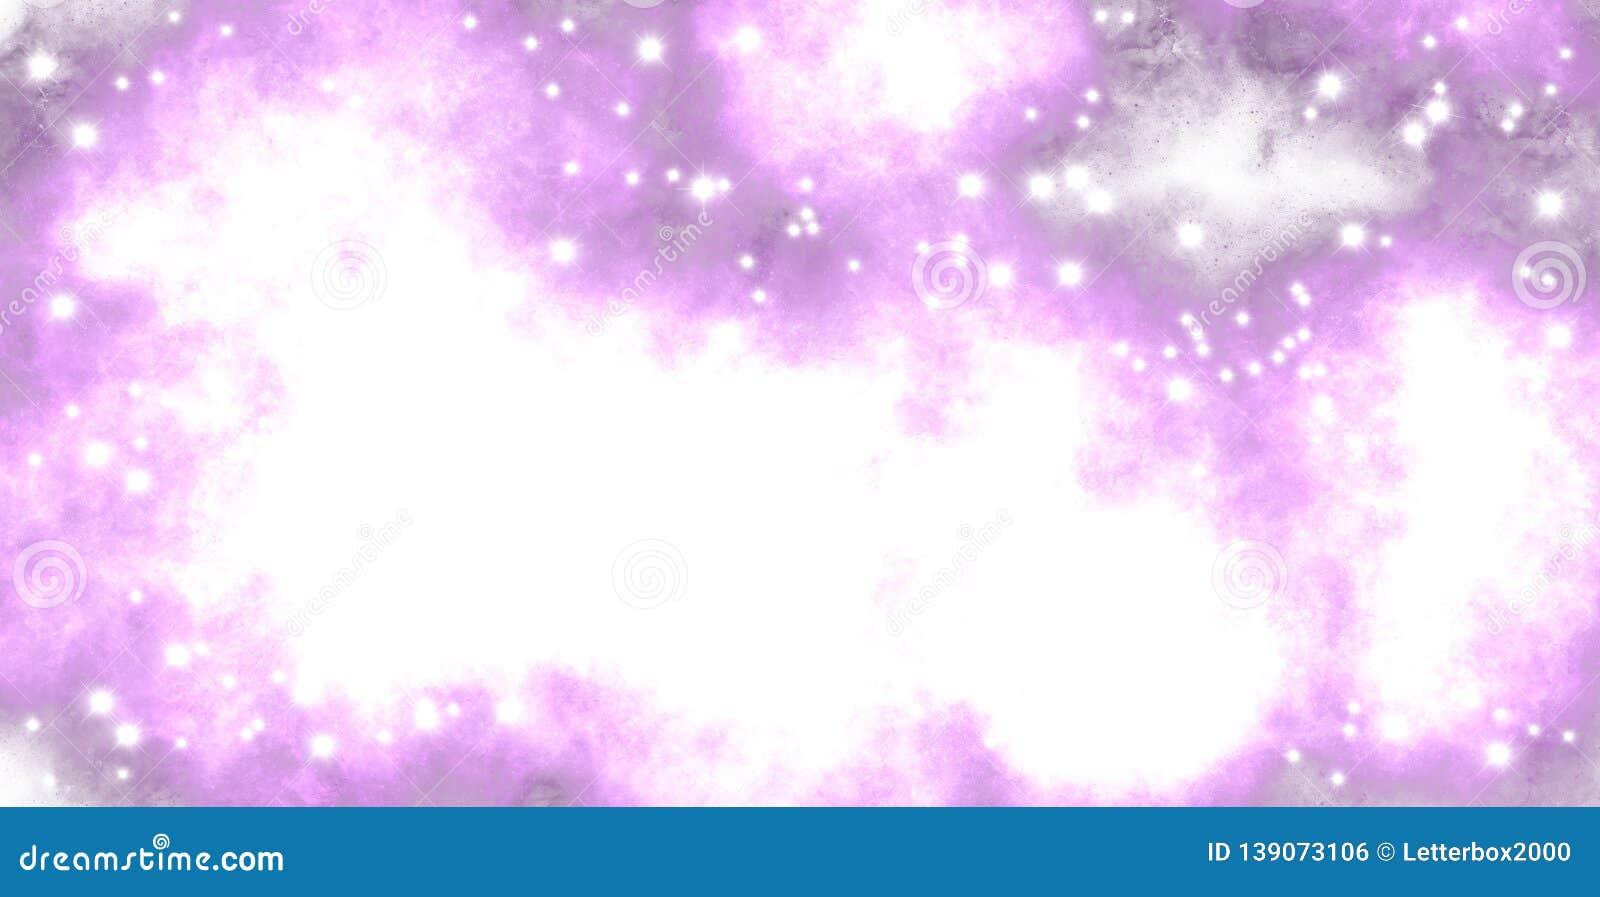 pink haze, space shiny stars